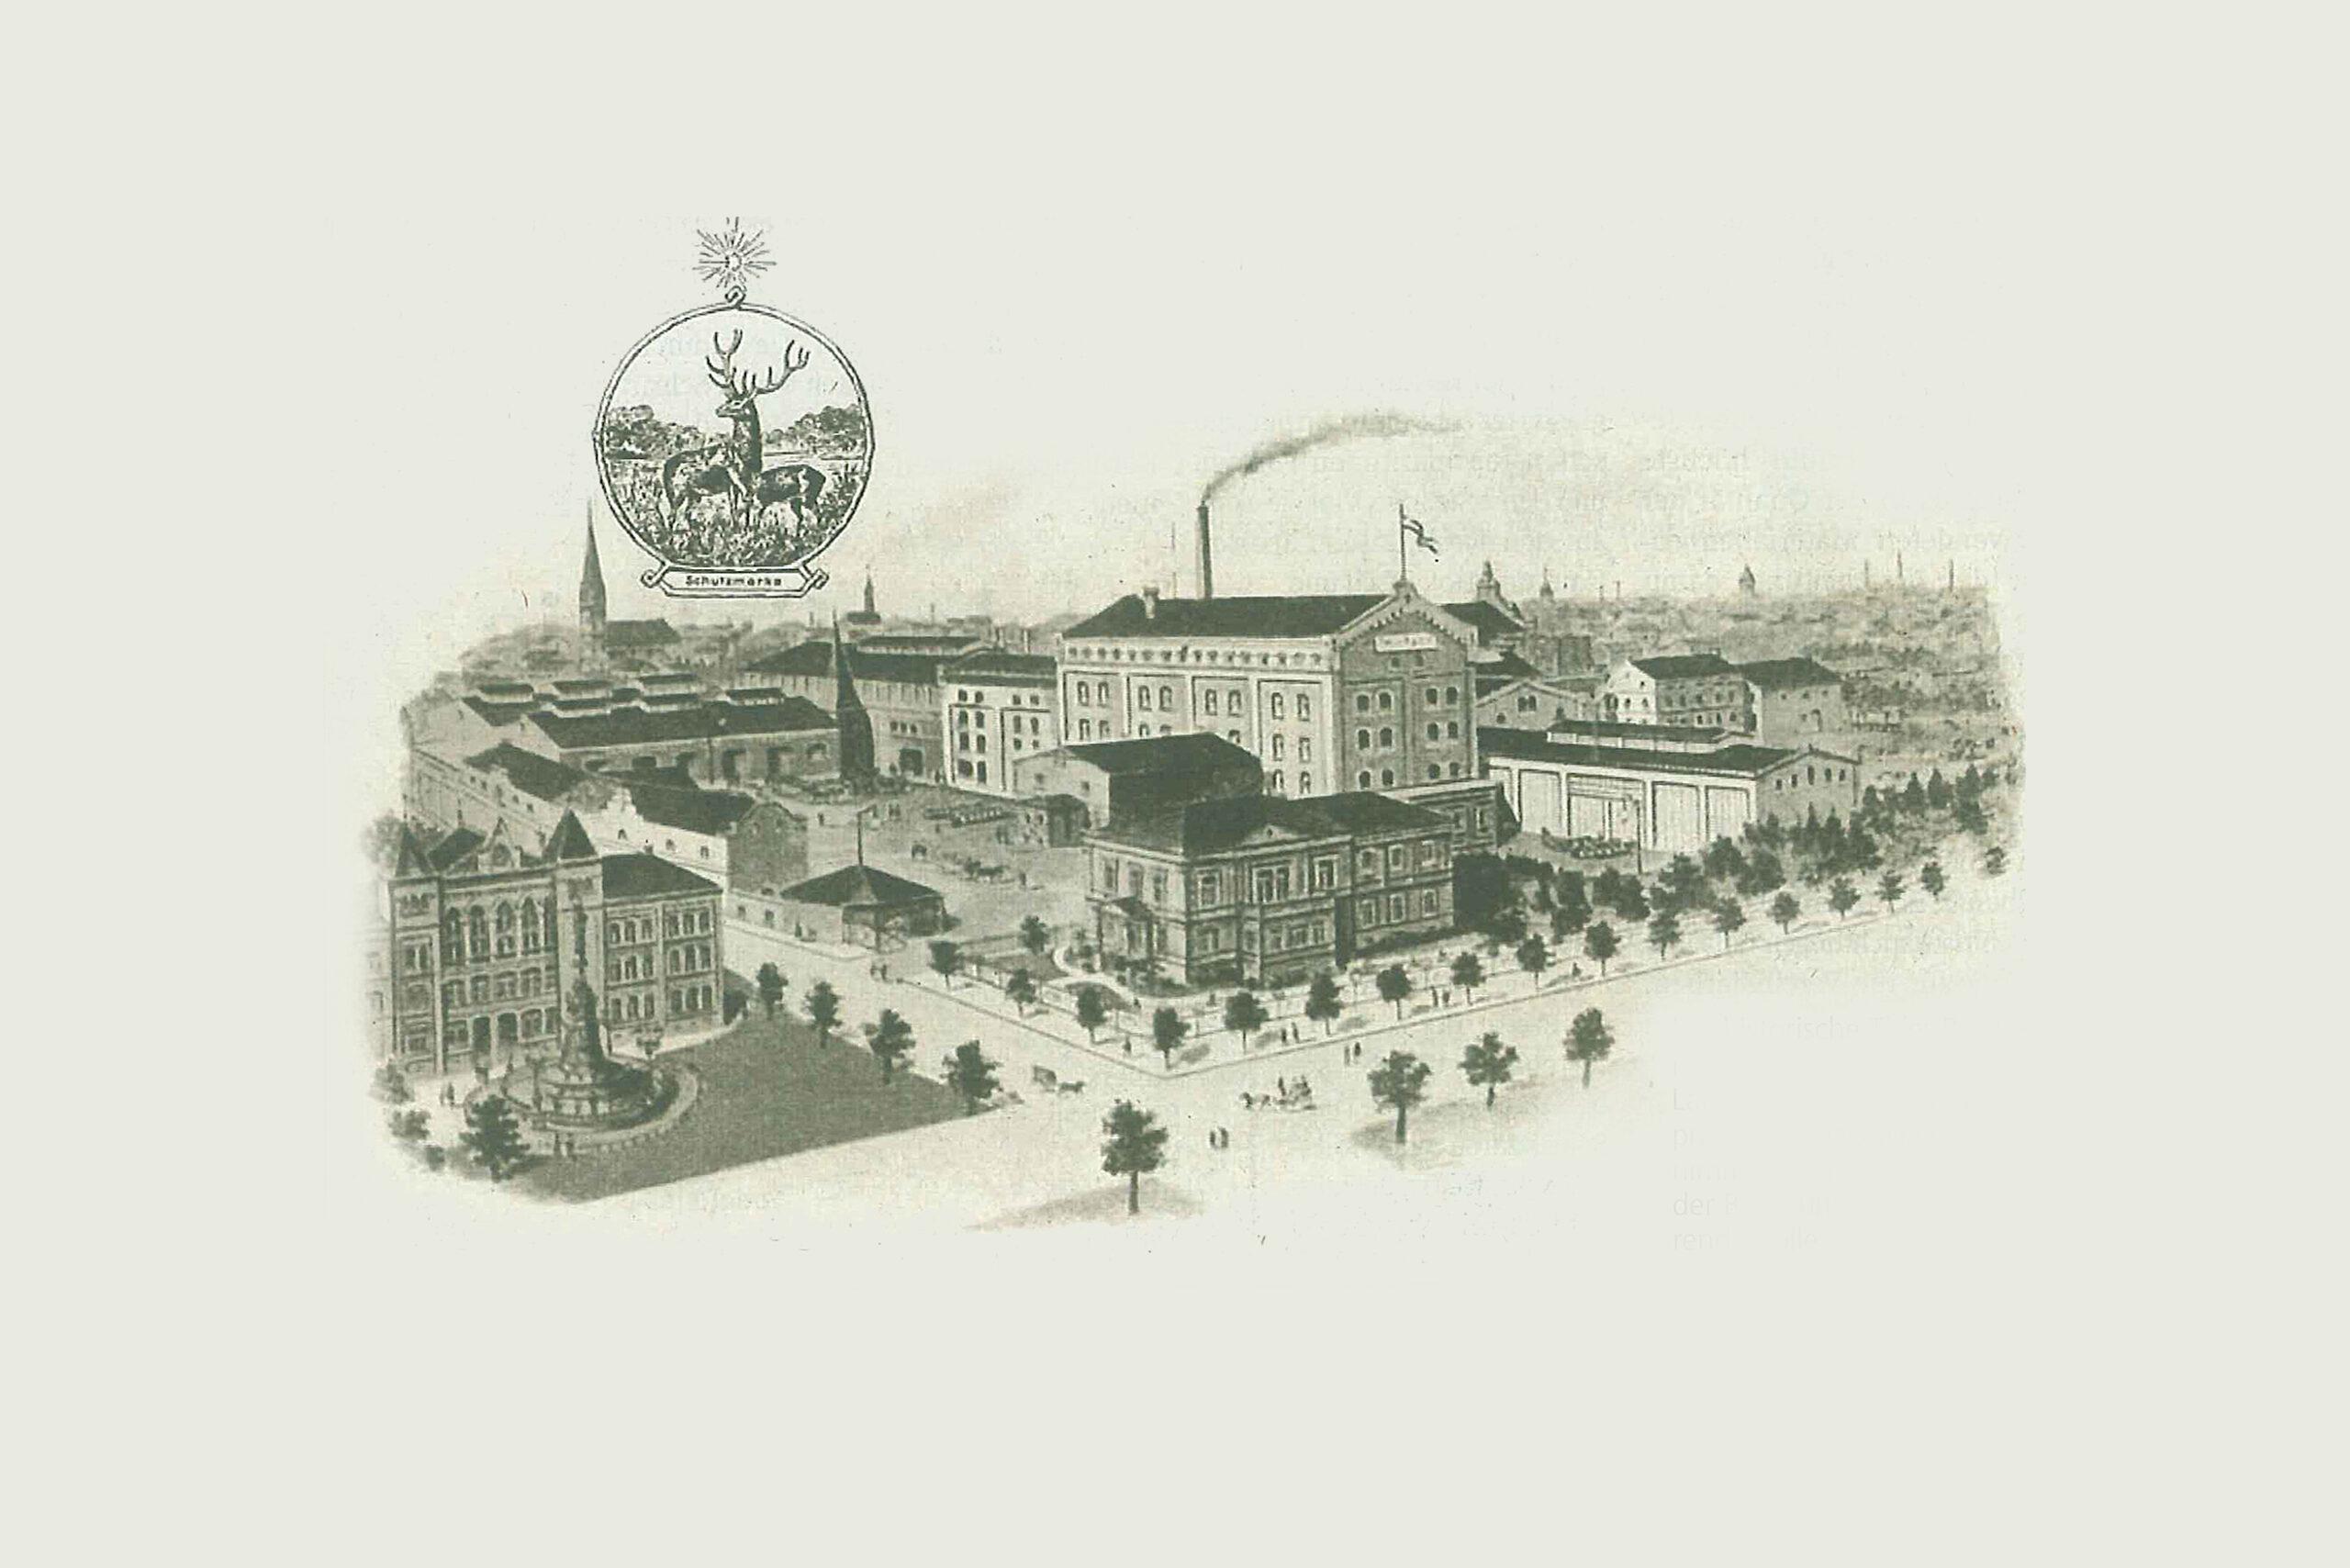 Historische Hier Brauerei (Dortmund Hoher Wall) – heute Hövels Hausbrauerei